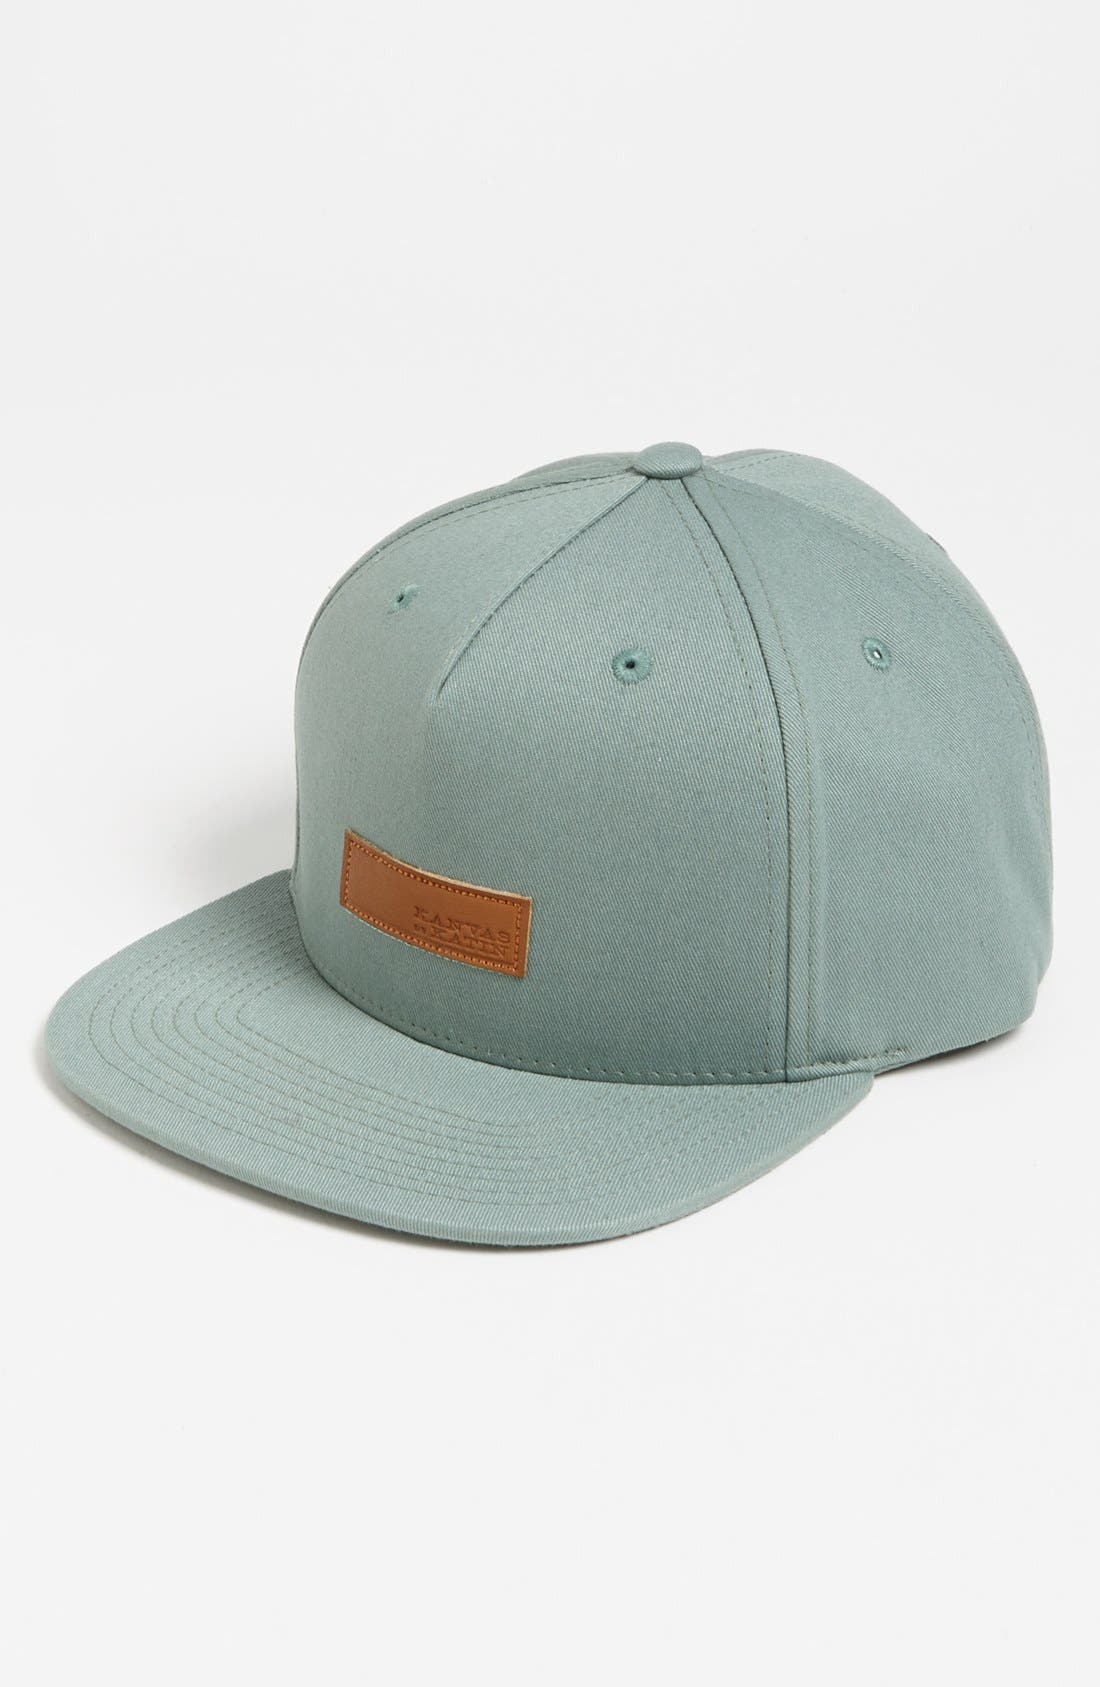 Alternate Image 1 Selected - Katin 'Watson' Baseball Cap